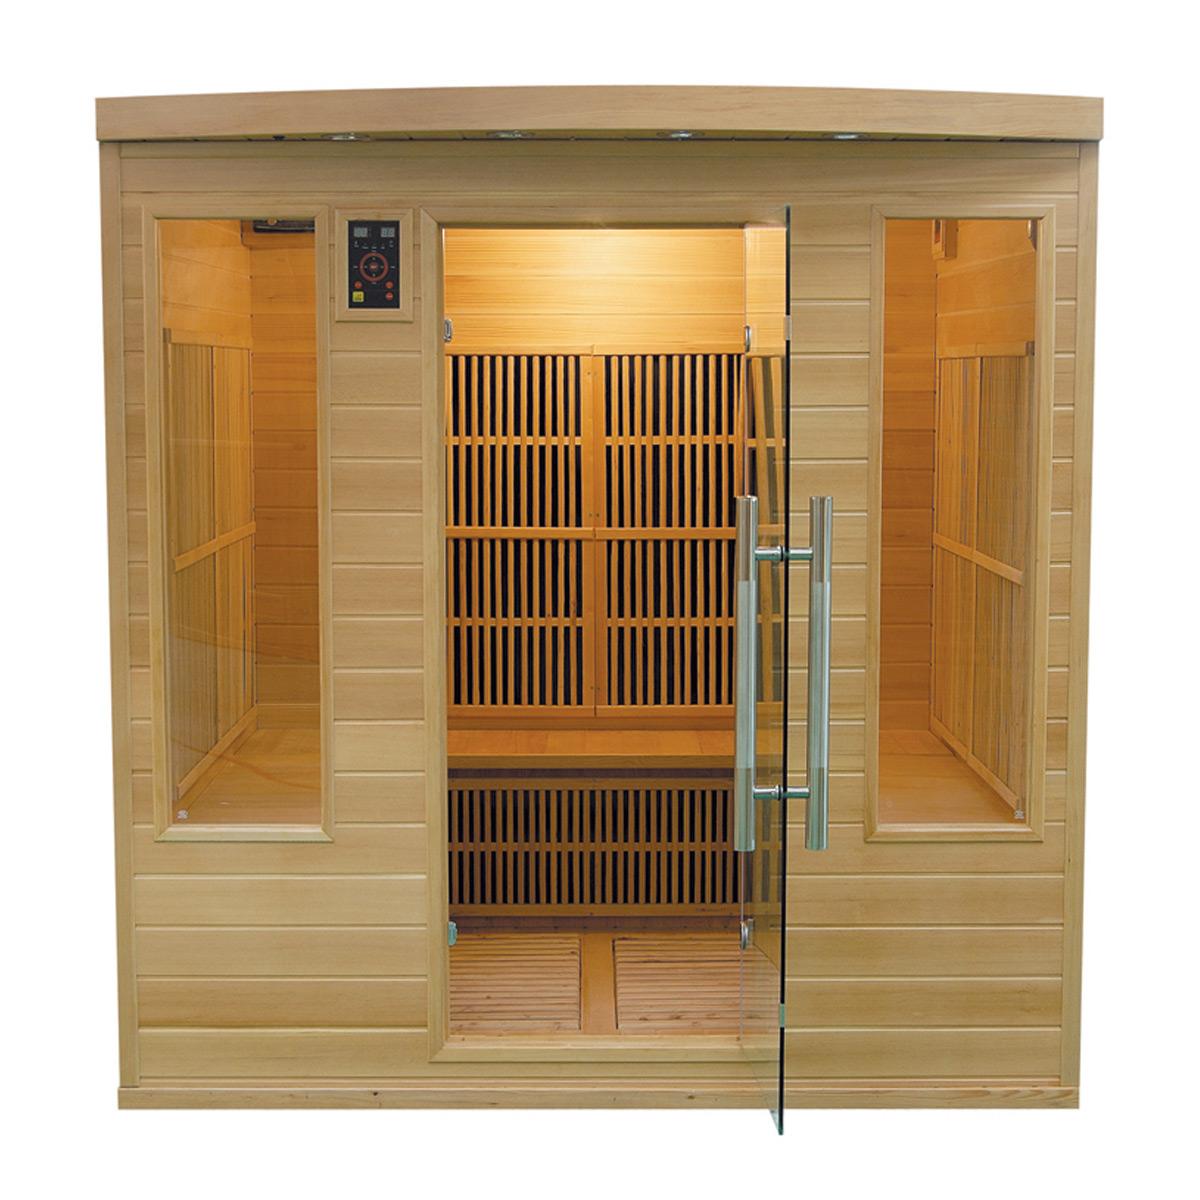 apollon family 4 6 places cabine sauna infrarouge. Black Bedroom Furniture Sets. Home Design Ideas